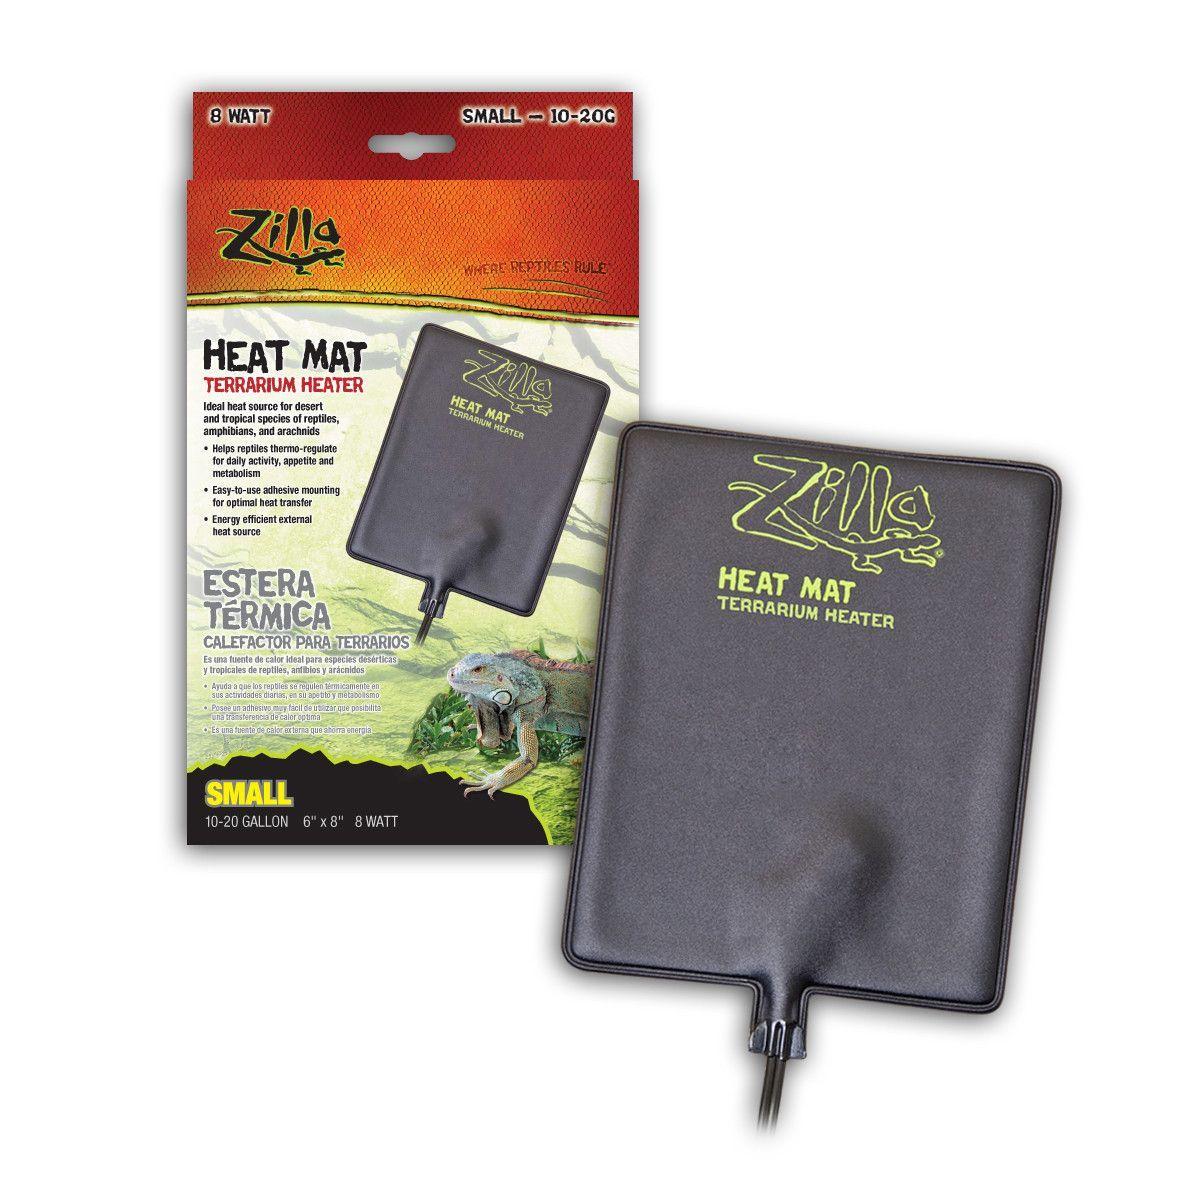 Zilla Terrarium Heater Heat Mat Sz Small Terrarium Reptile Supplies Reptile Terrarium